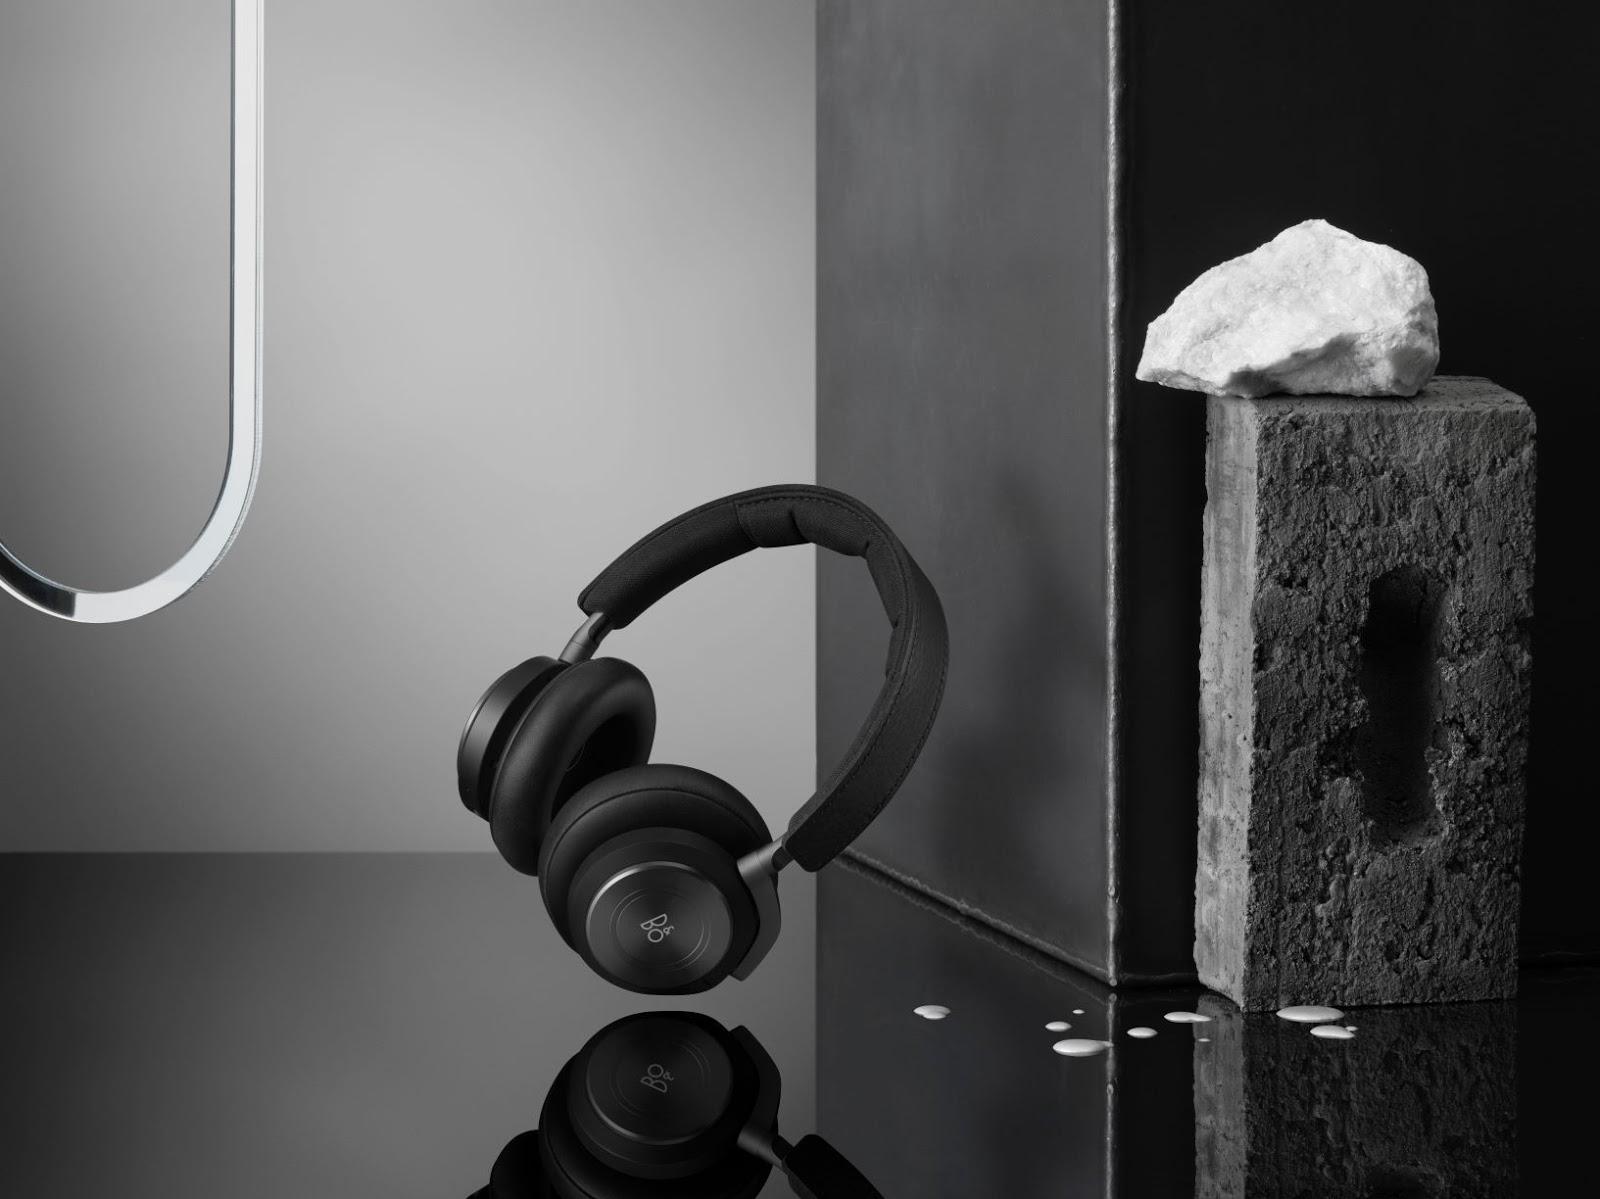 Bang & Olufsen เปิดตัว Beoplay H9 หูฟังรุ่นใหม่ โดดเด่นด้วยแบตเตอรี่ที่ใช้งานได้ยาวนานและฟีเจอร์คำสั่งเสียงสุดไฮเทค